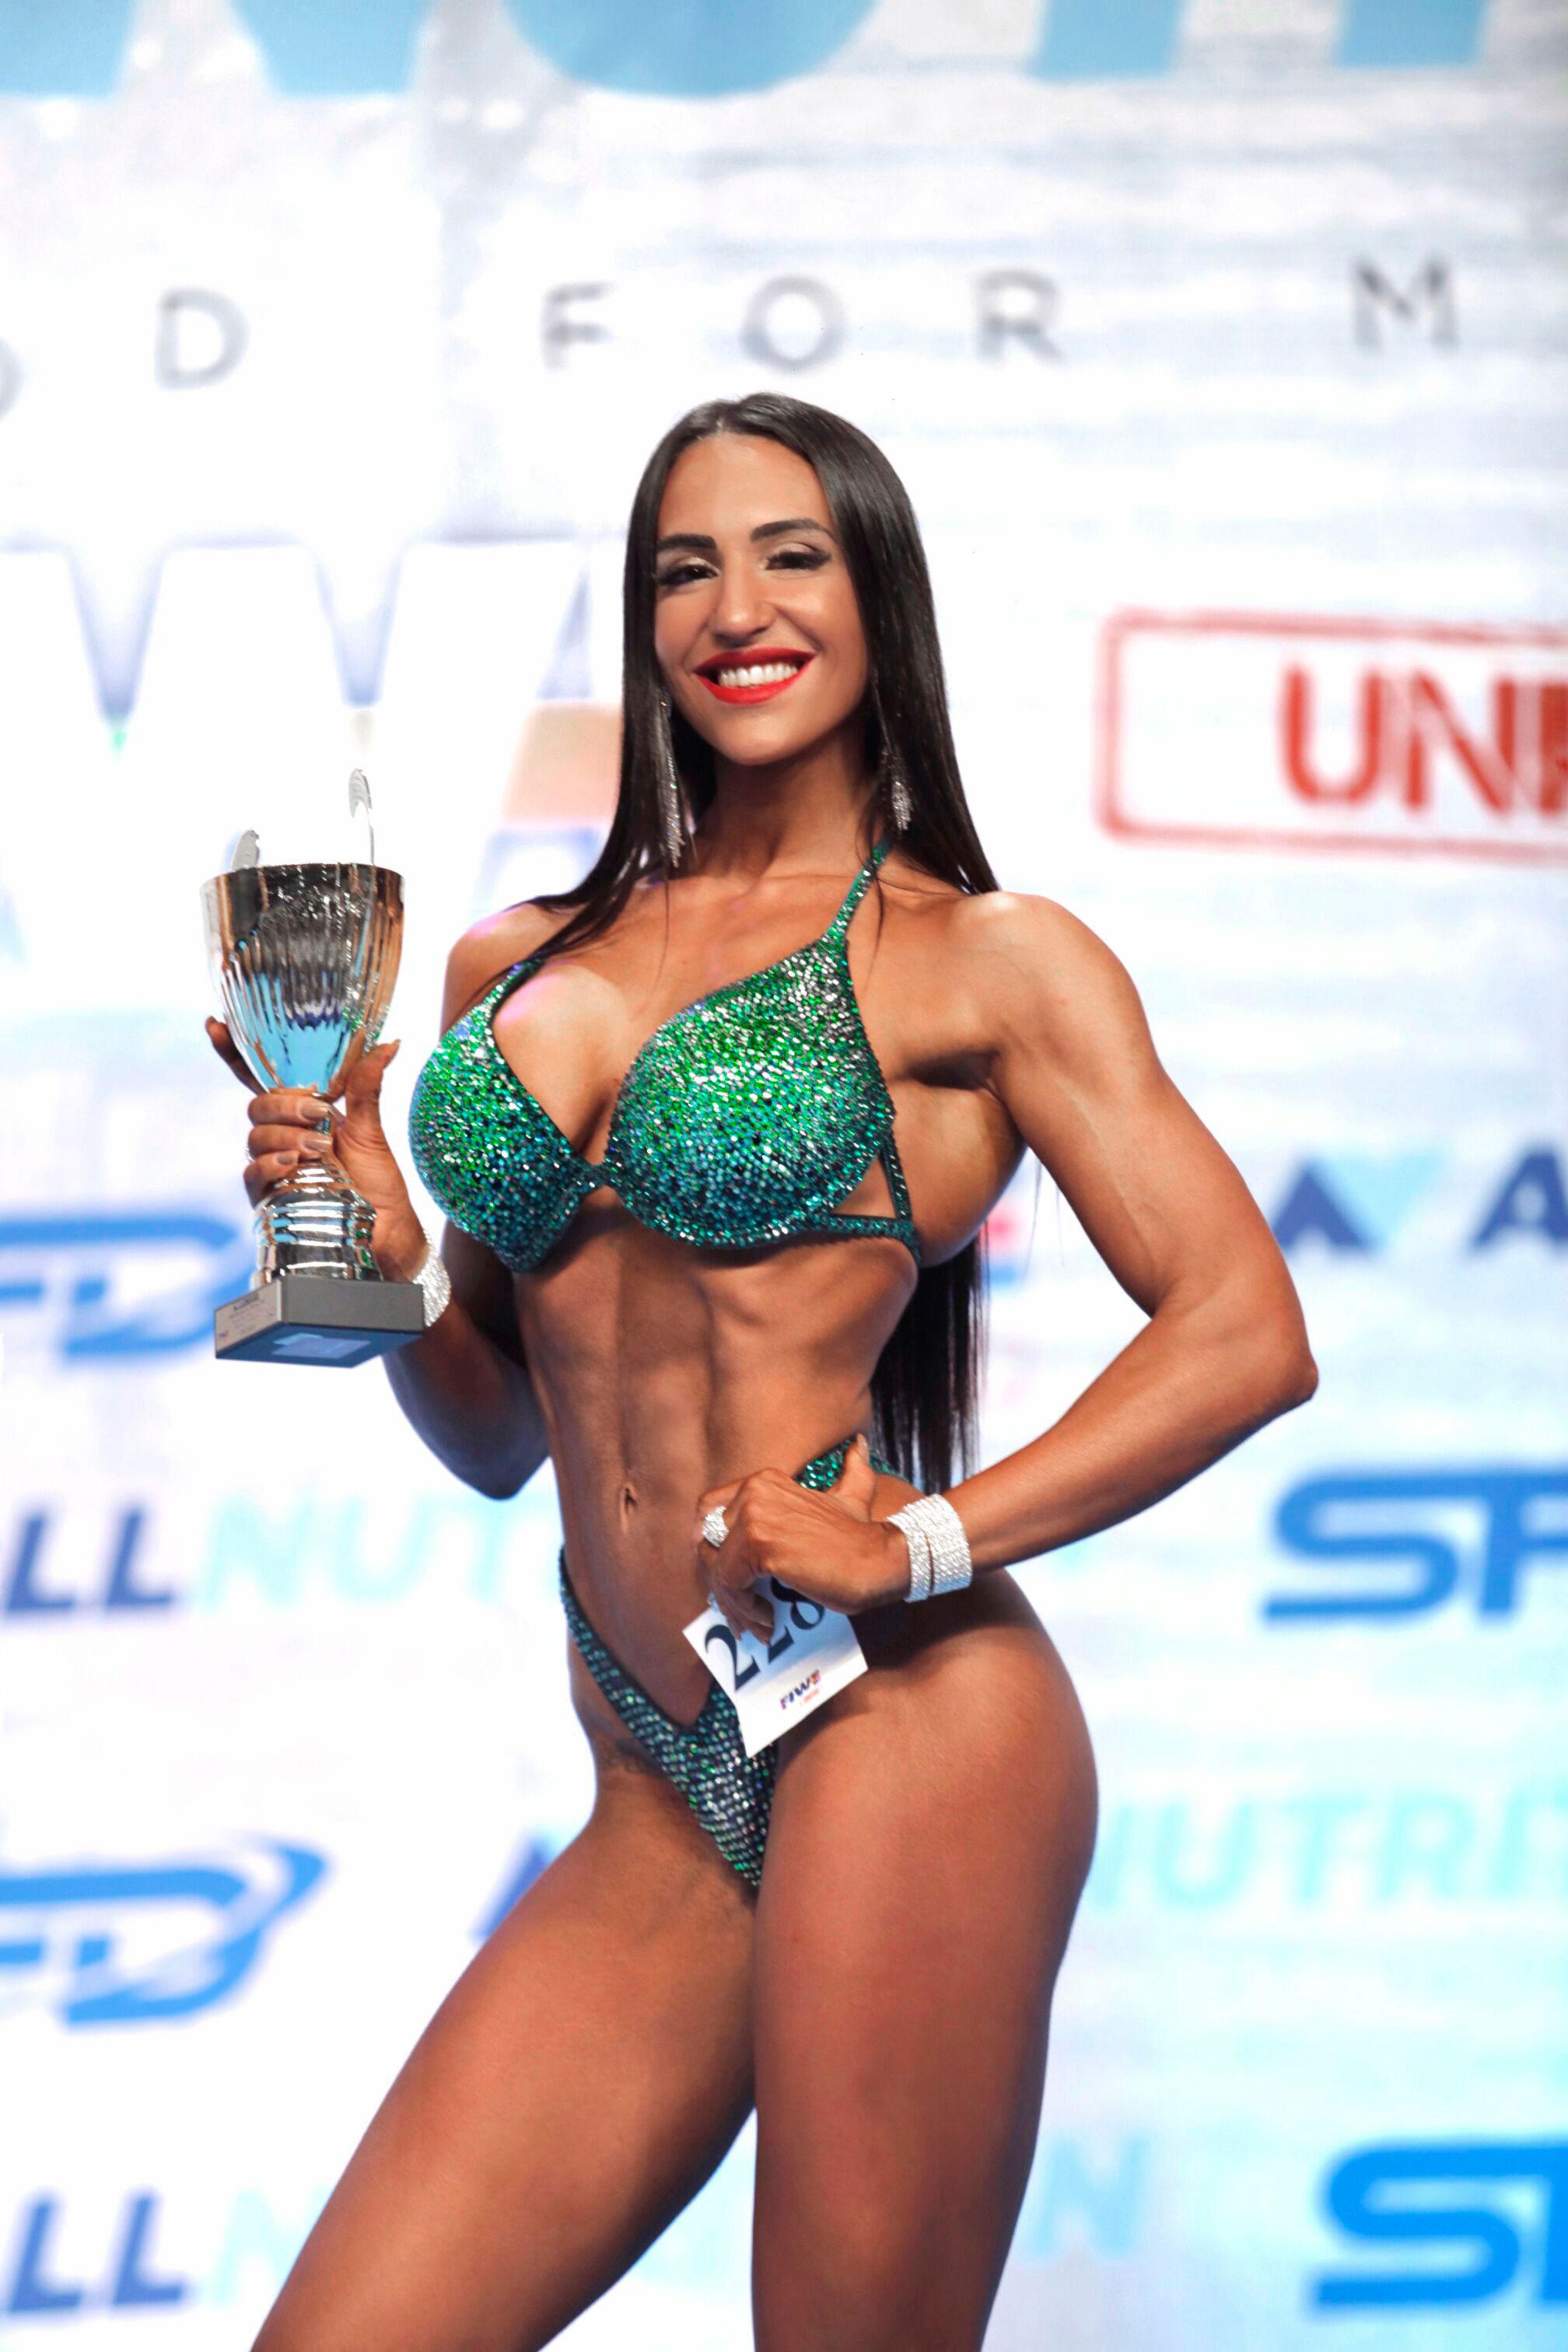 Campeona competición bikini